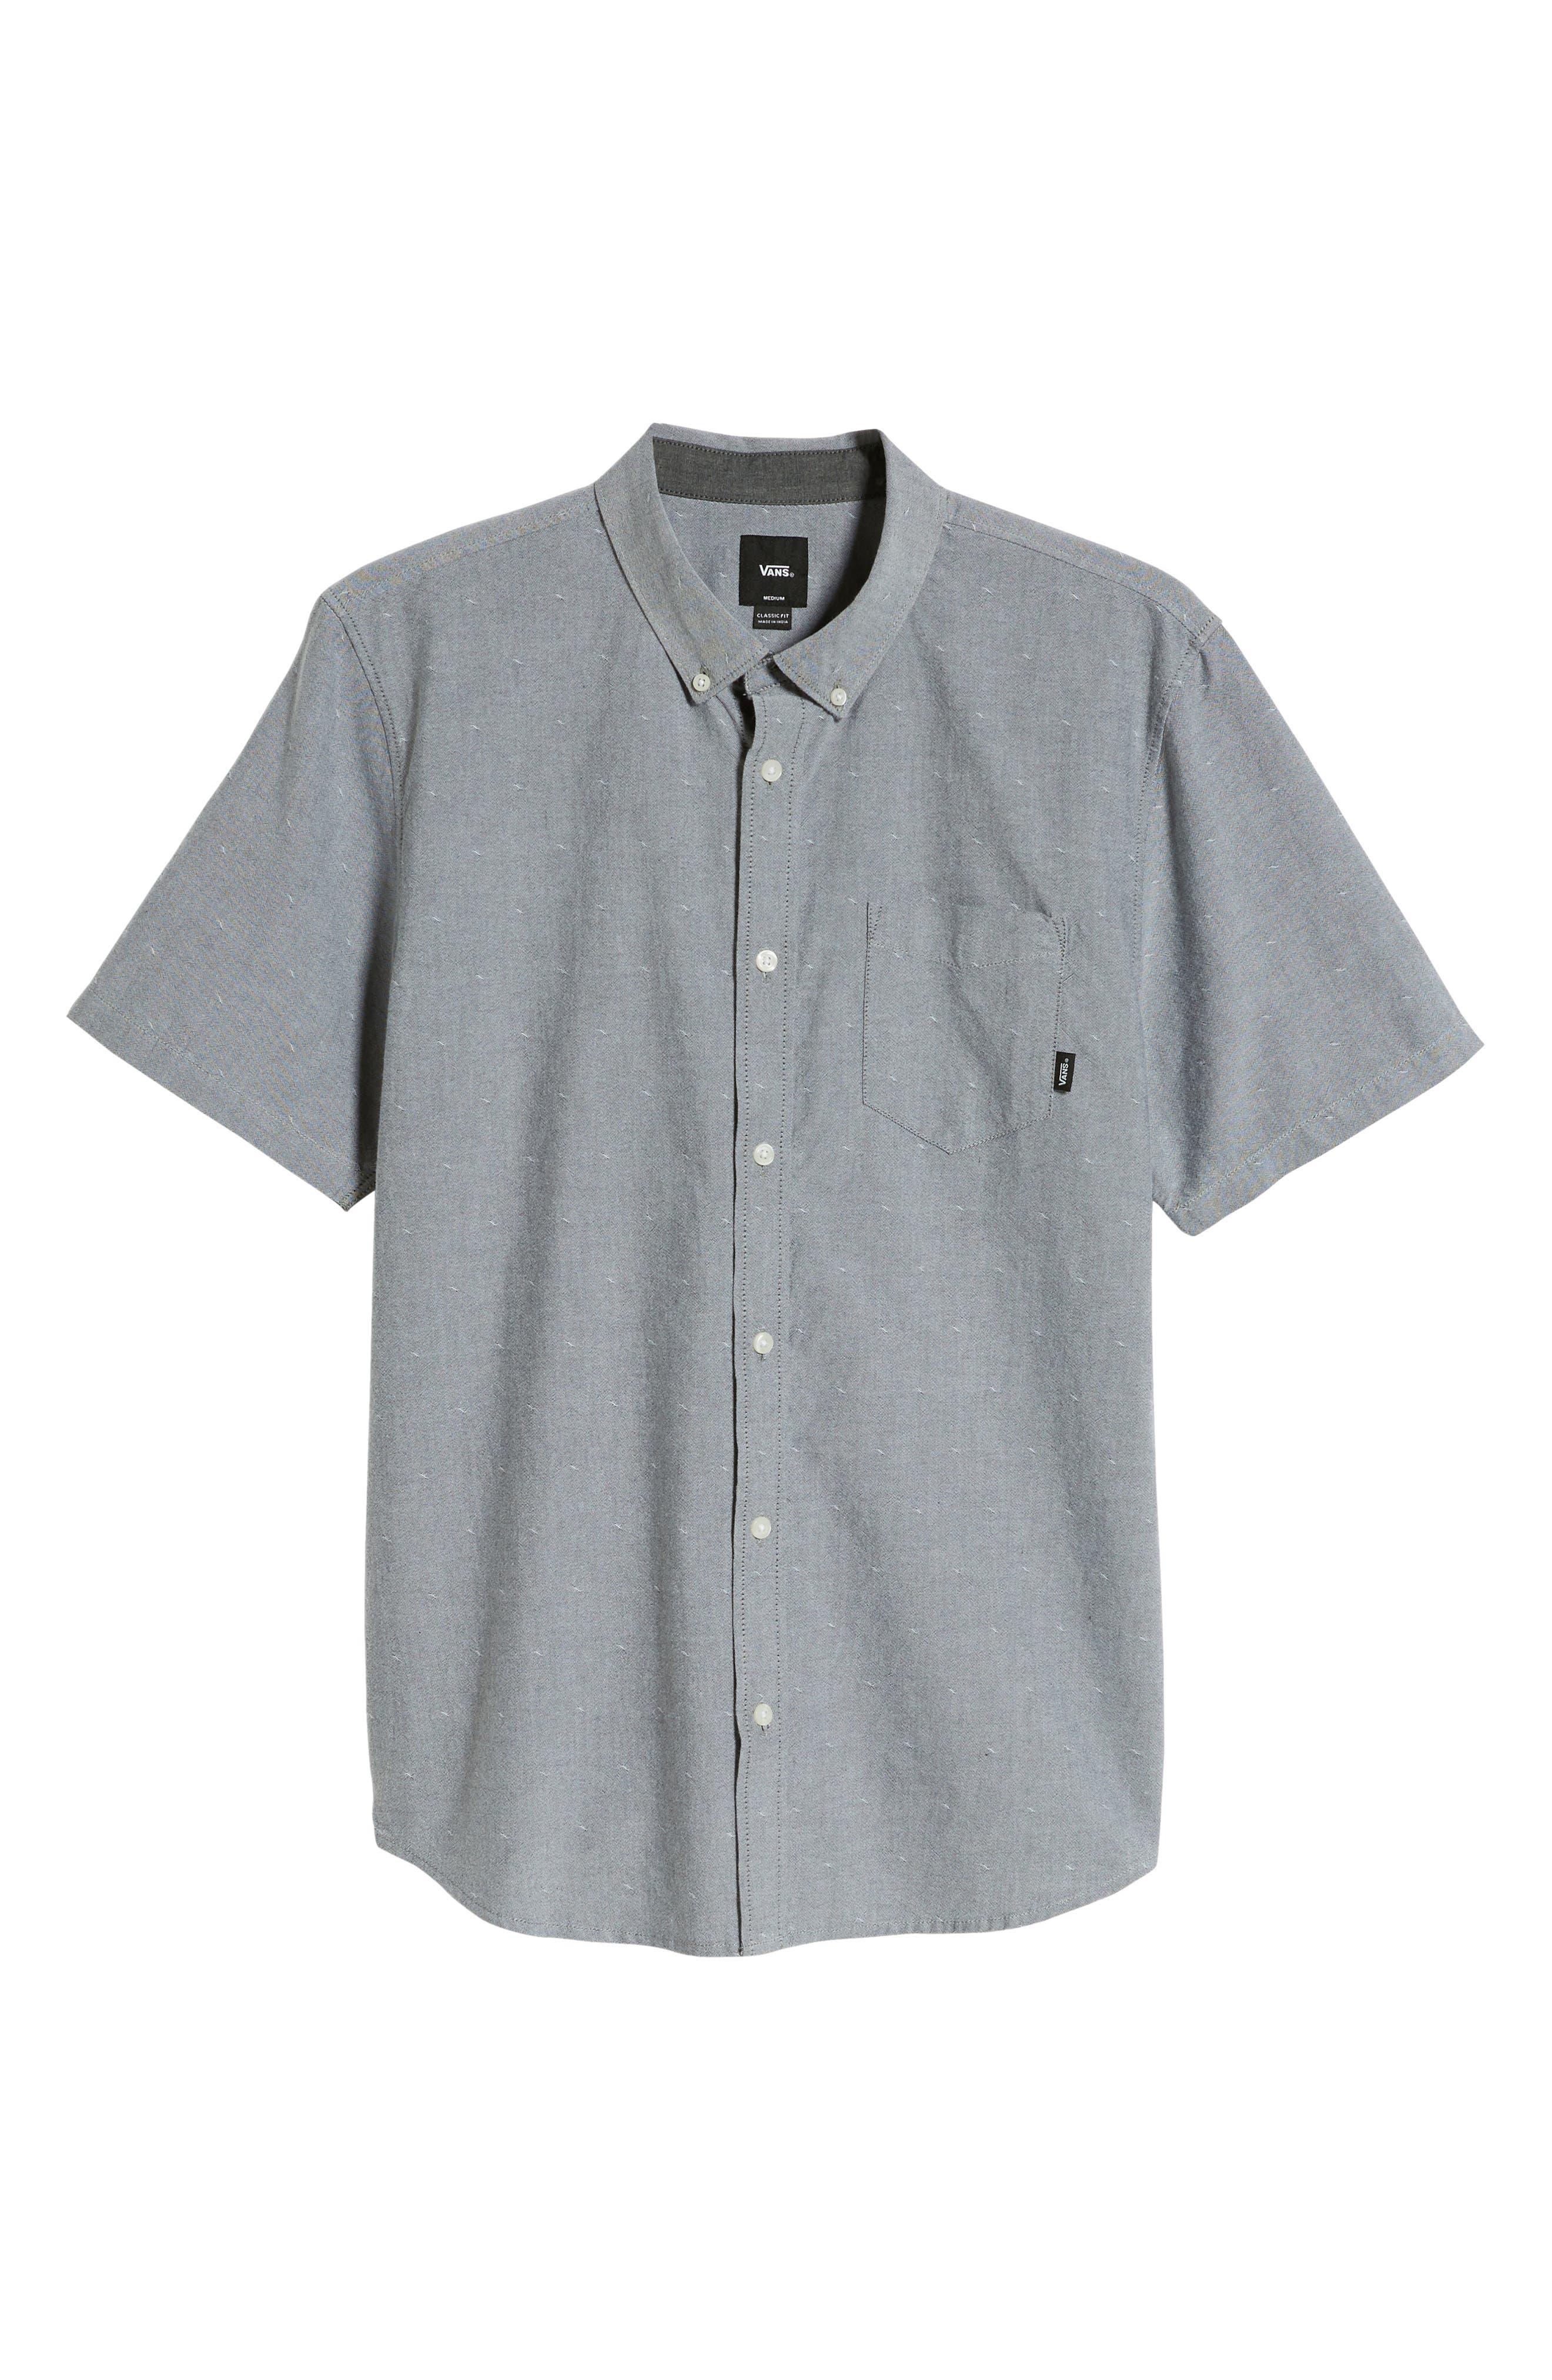 37b2de6f70 Vans Men s Casual Button-Down Shirts Shoes   Fashion